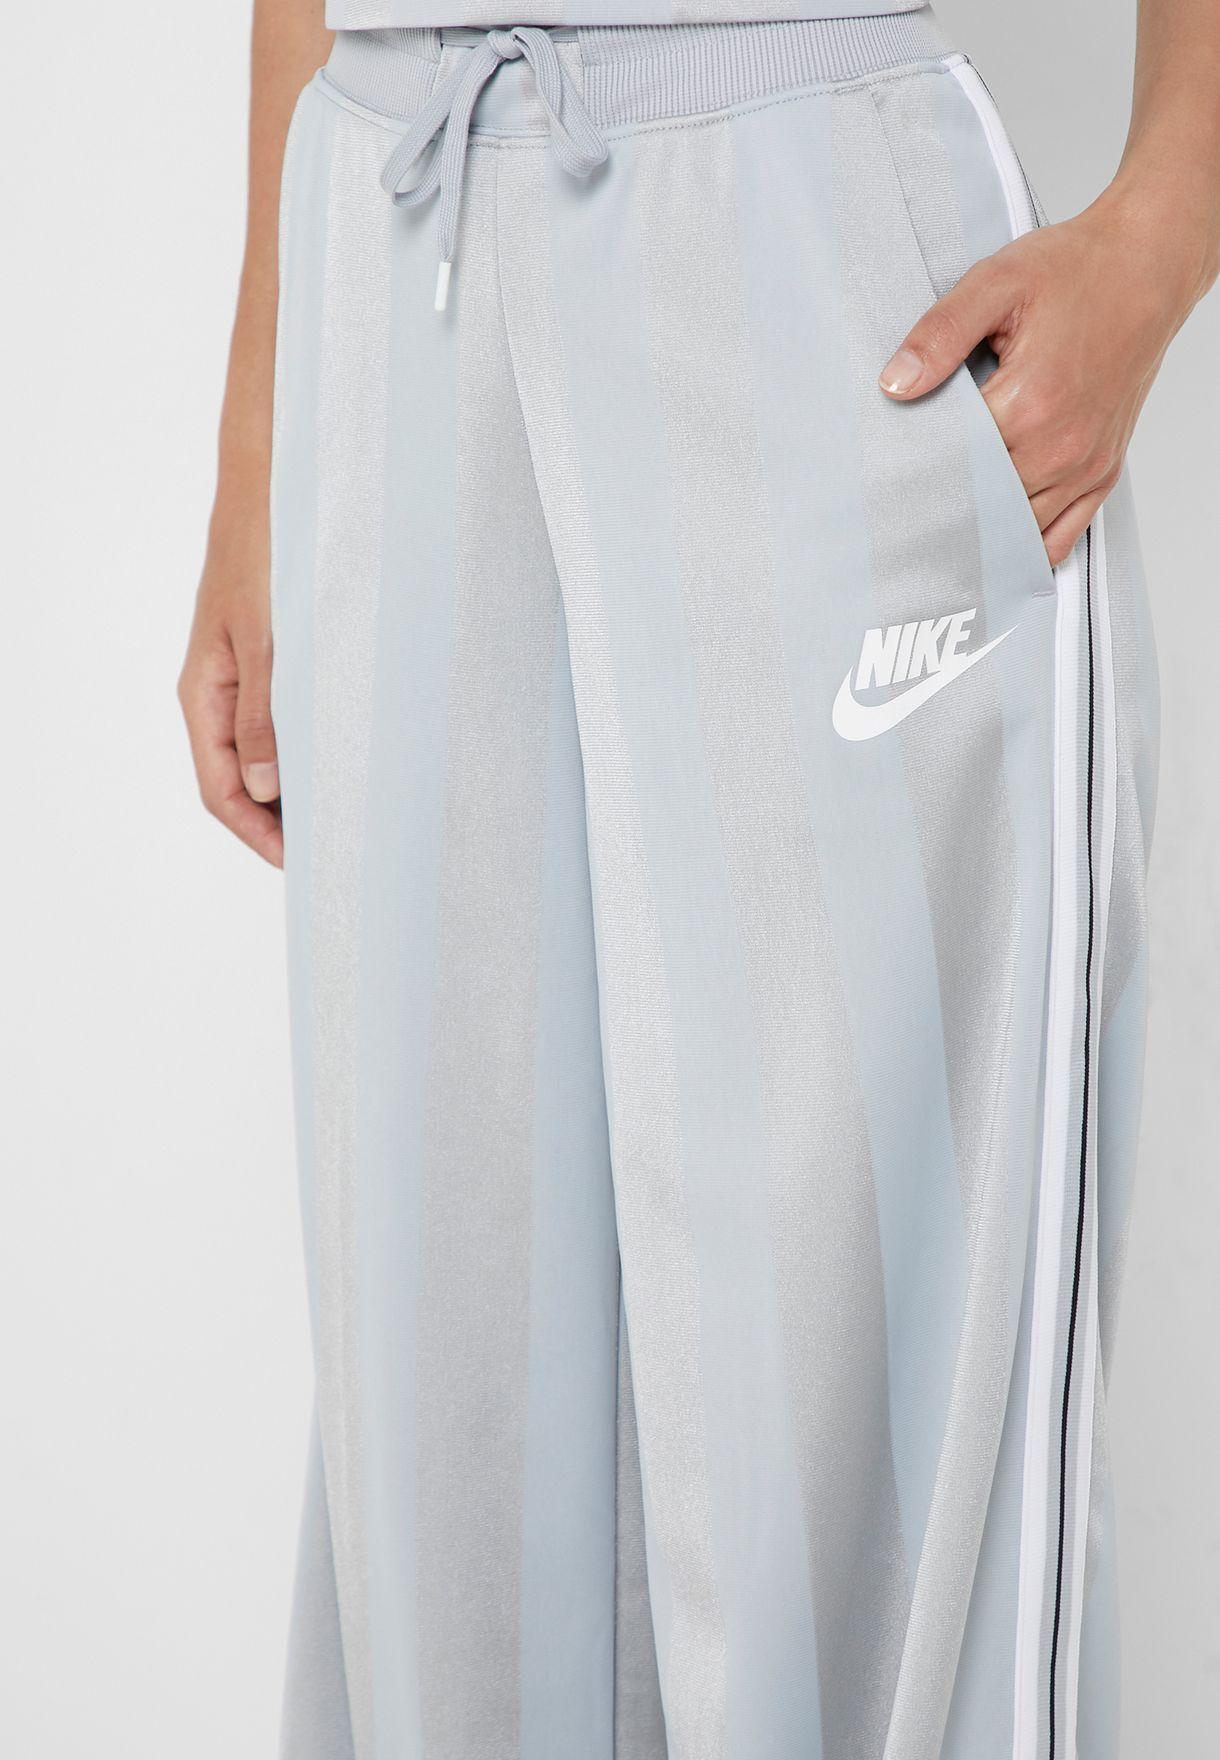 Shadow Striped Sweatpants